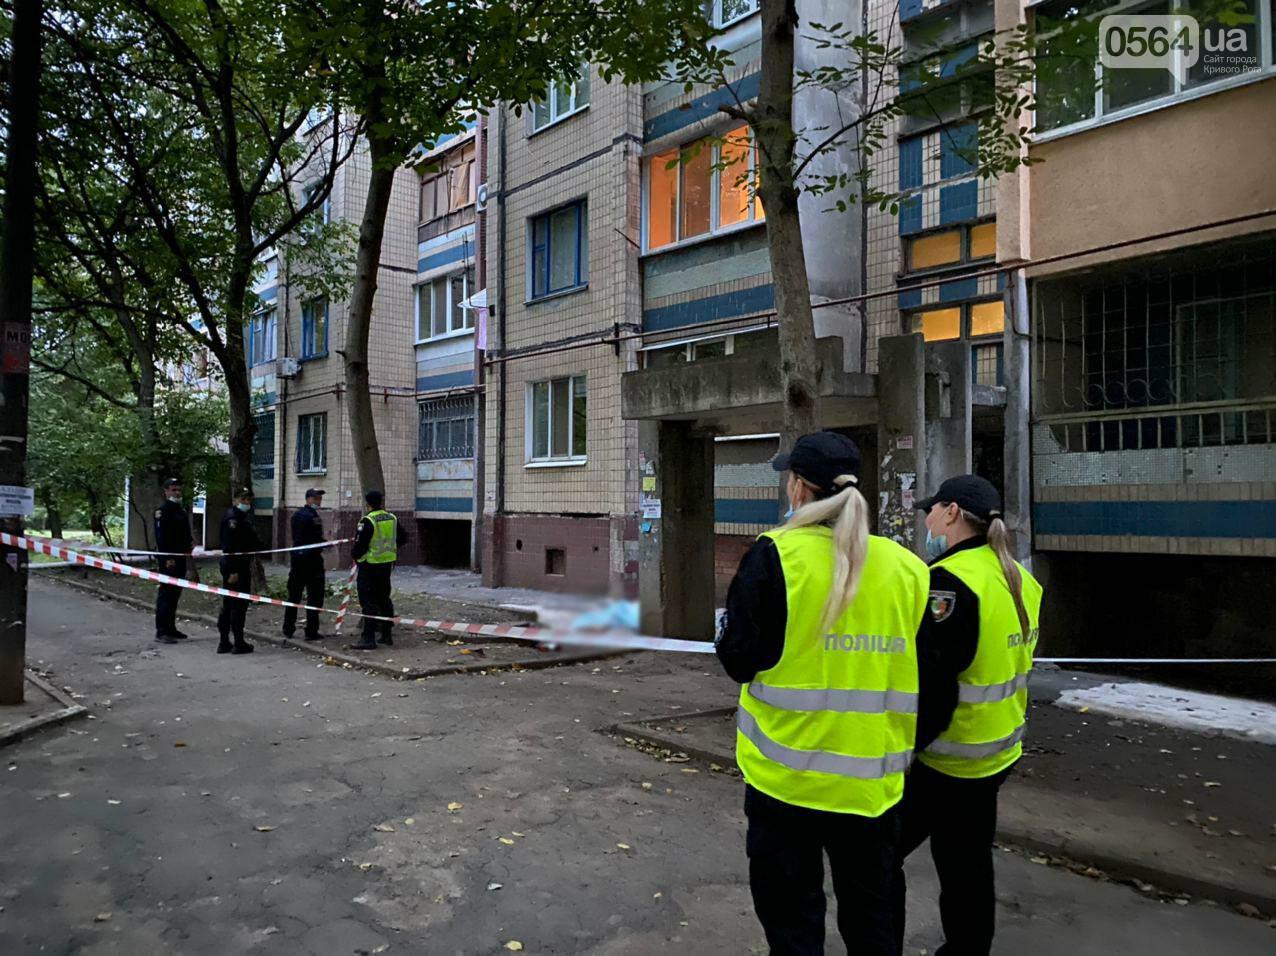 В Кривом Роге погиб мужчина, упавший с 5 этажа жилого дома, - ФОТО 18+, фото-2